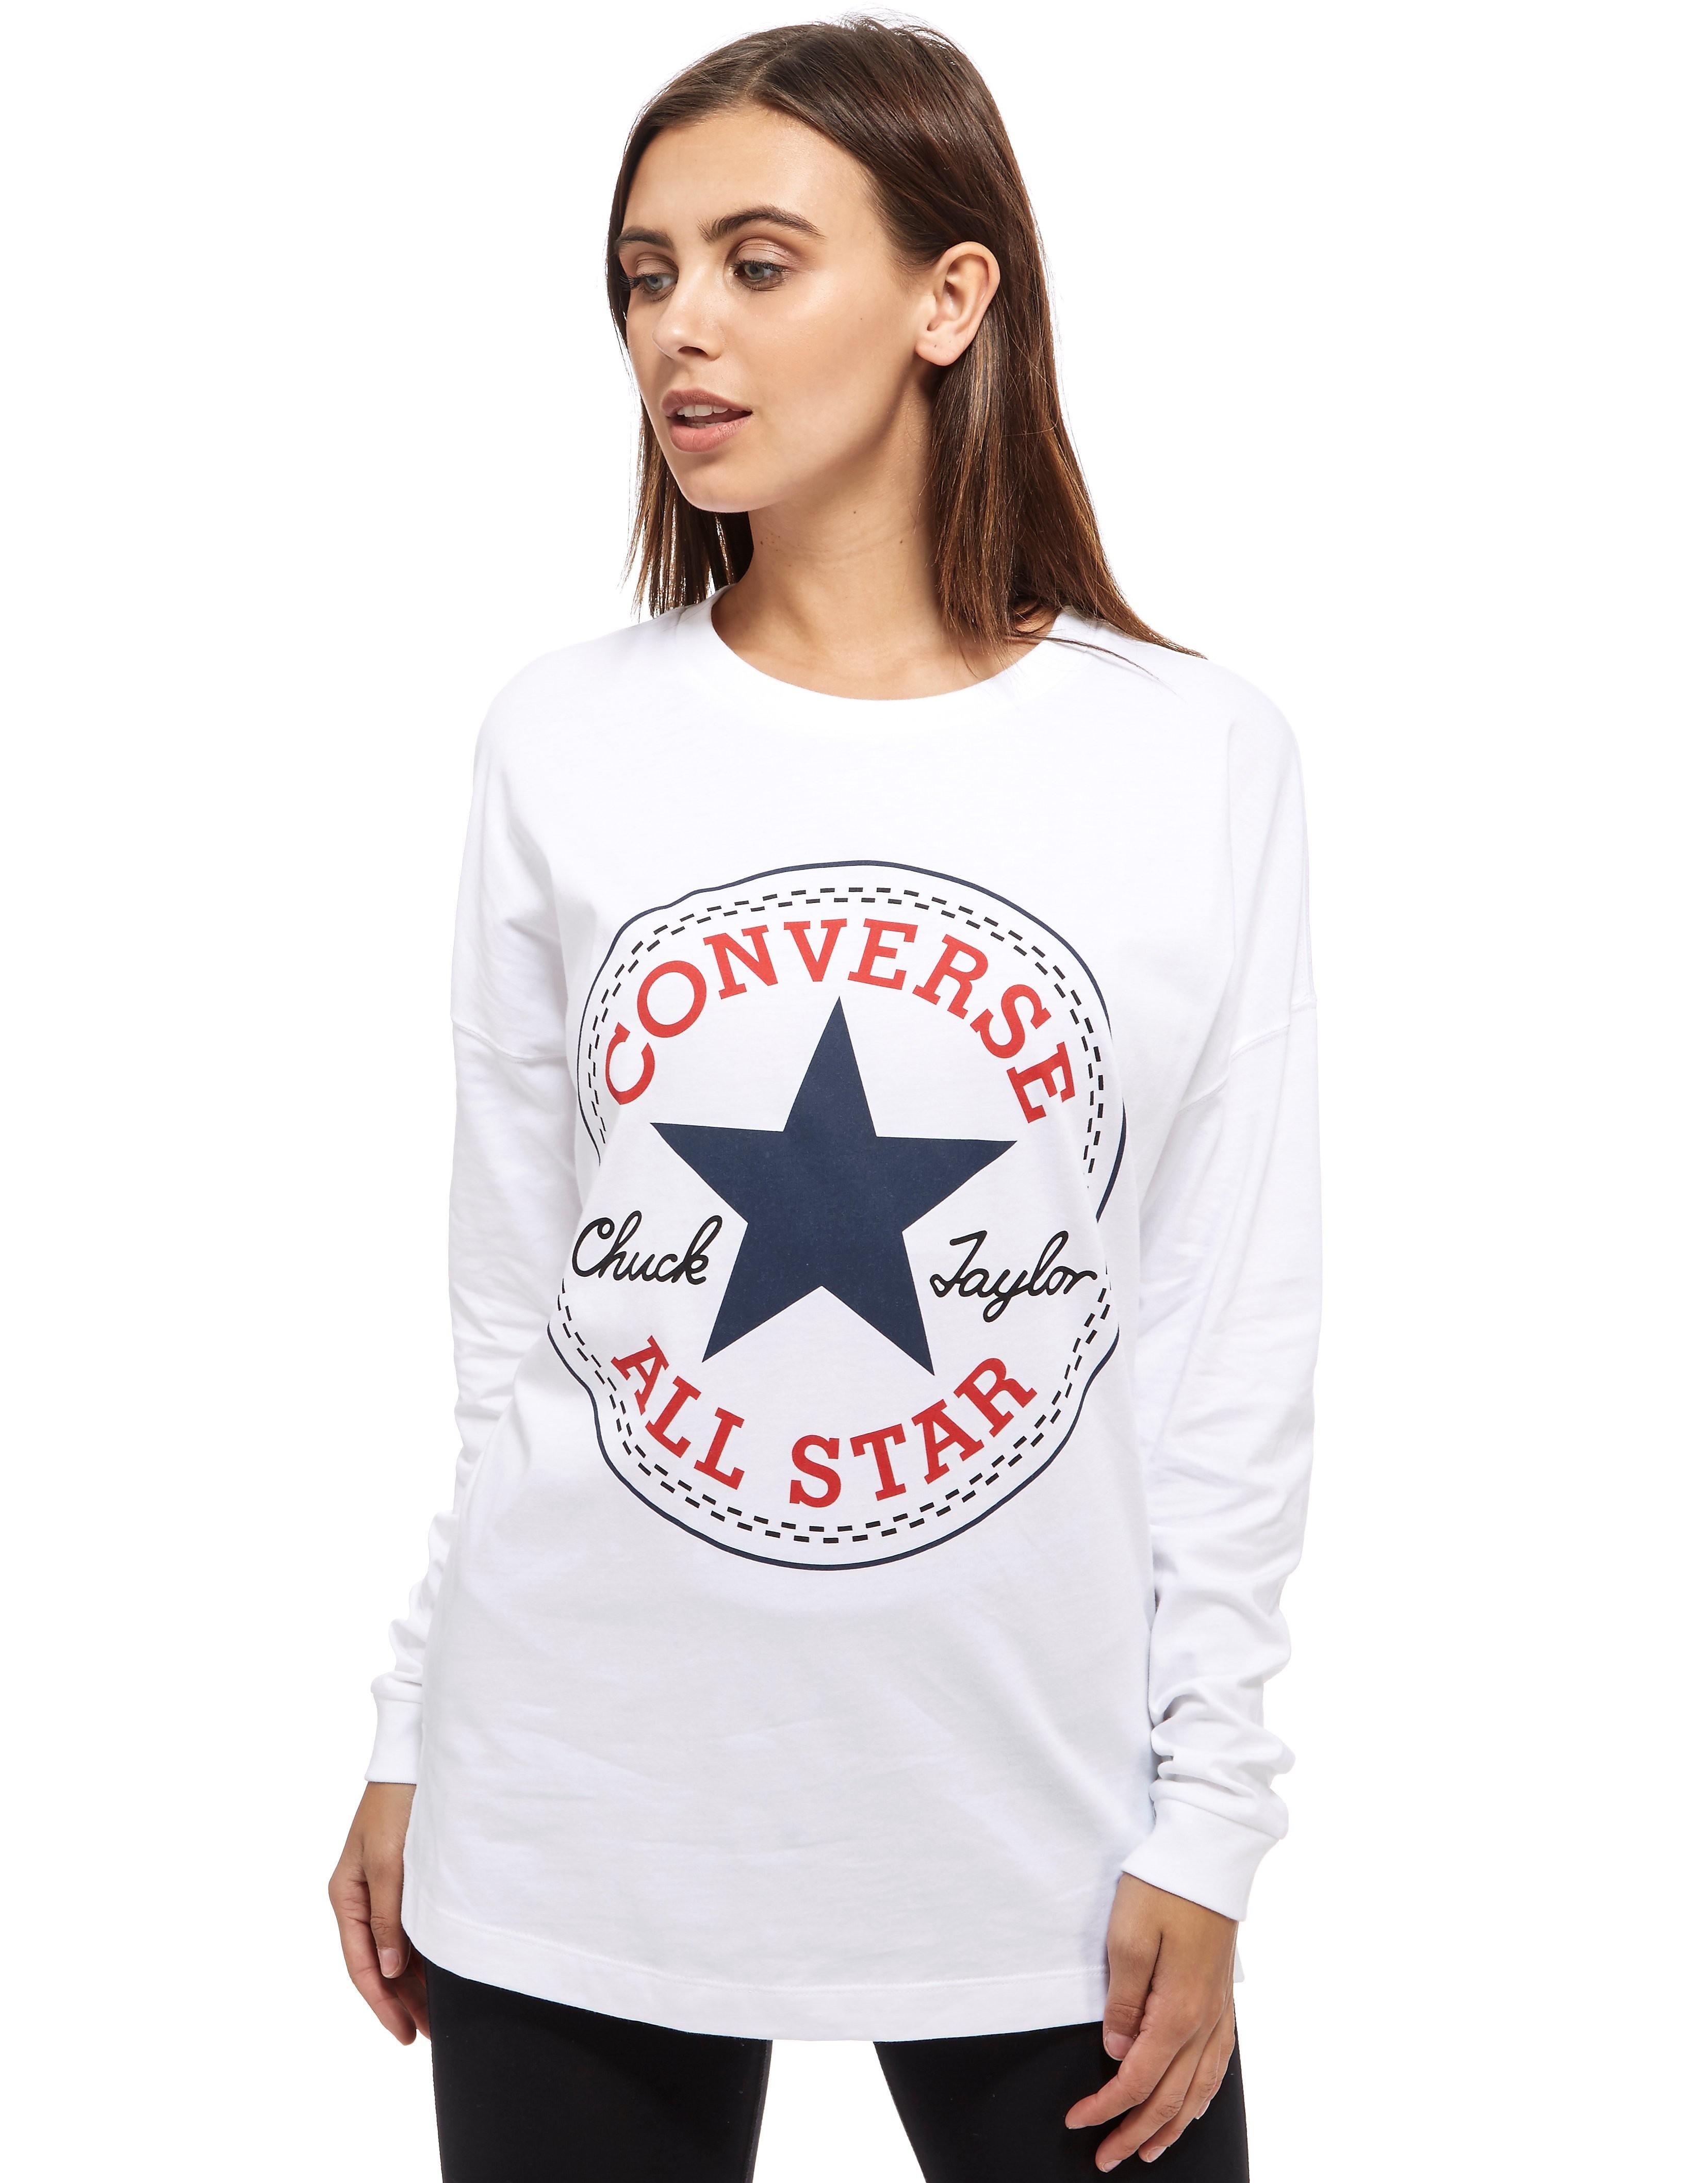 Converse Chuck Long Sleeve Logo T-Shirt - White, White